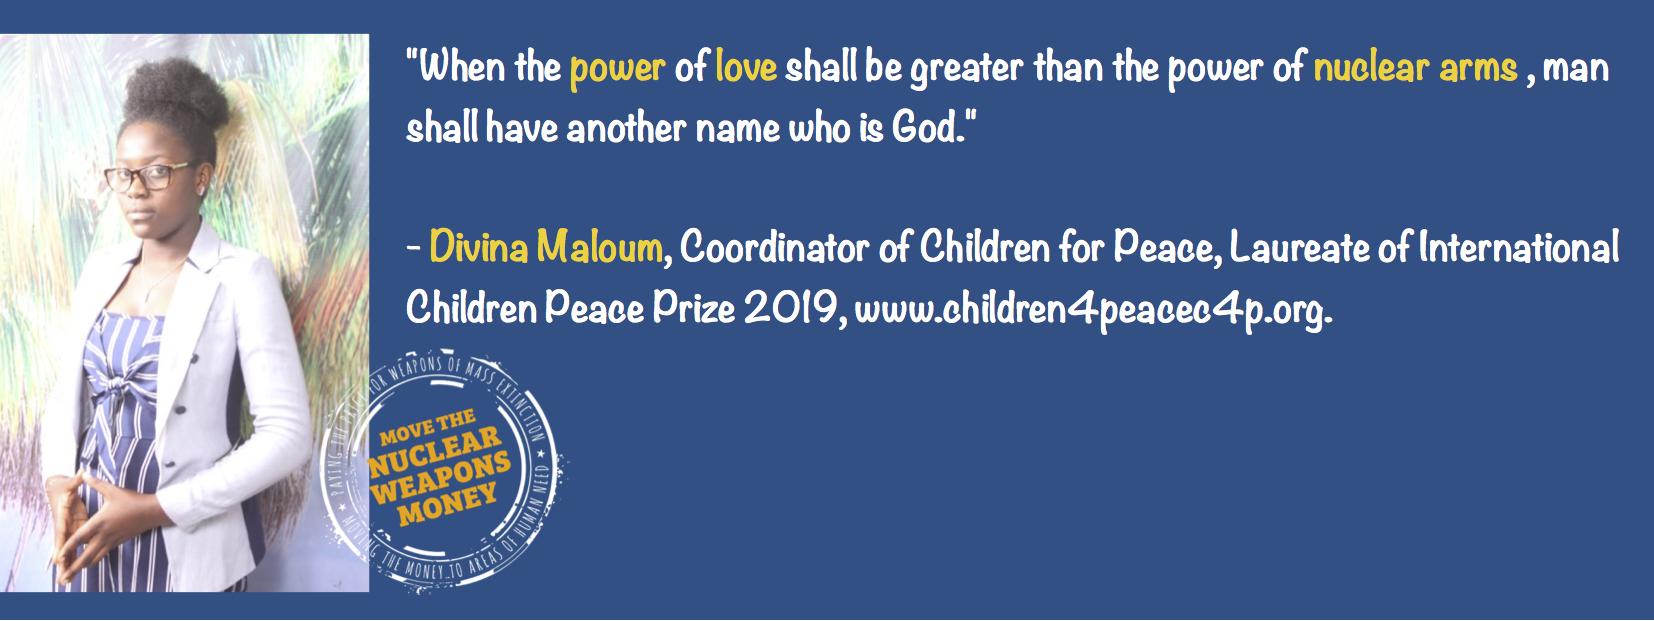 Divina-Maloum-Cameroon.-Winner-of-2019-International-Childrens-Prize